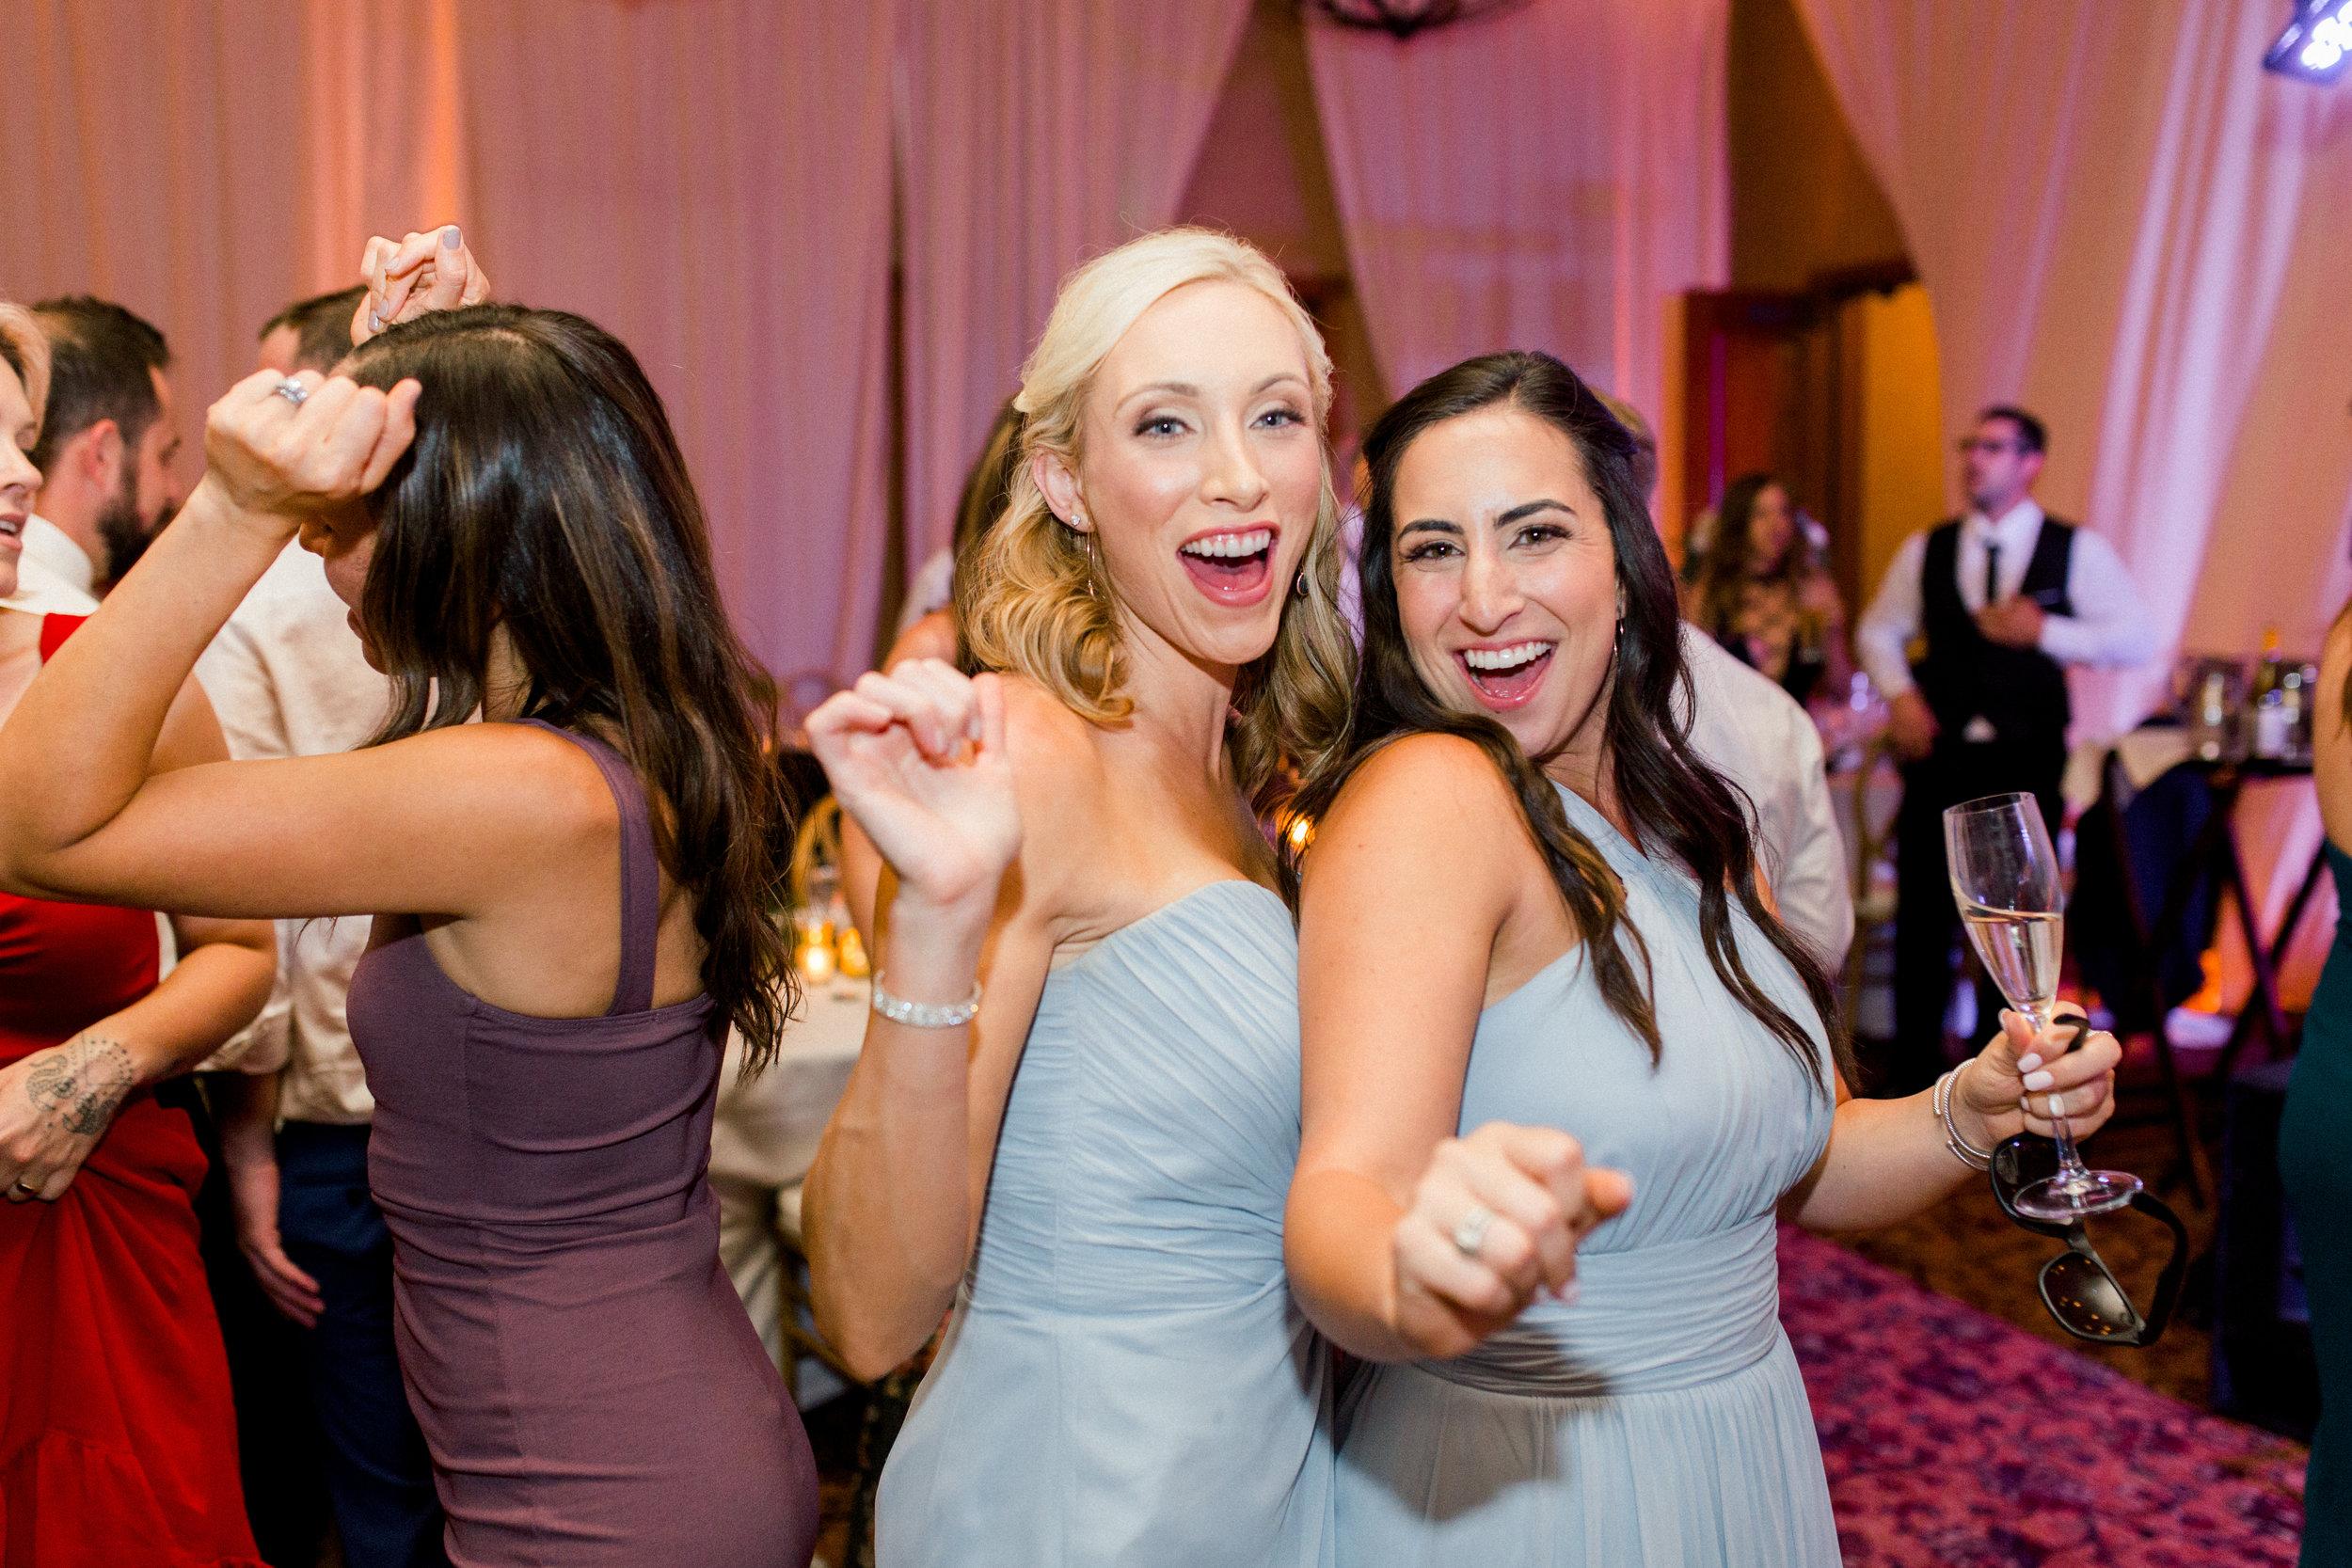 vintners-inn-wedding-in-santa-rosa-california-115.jpg